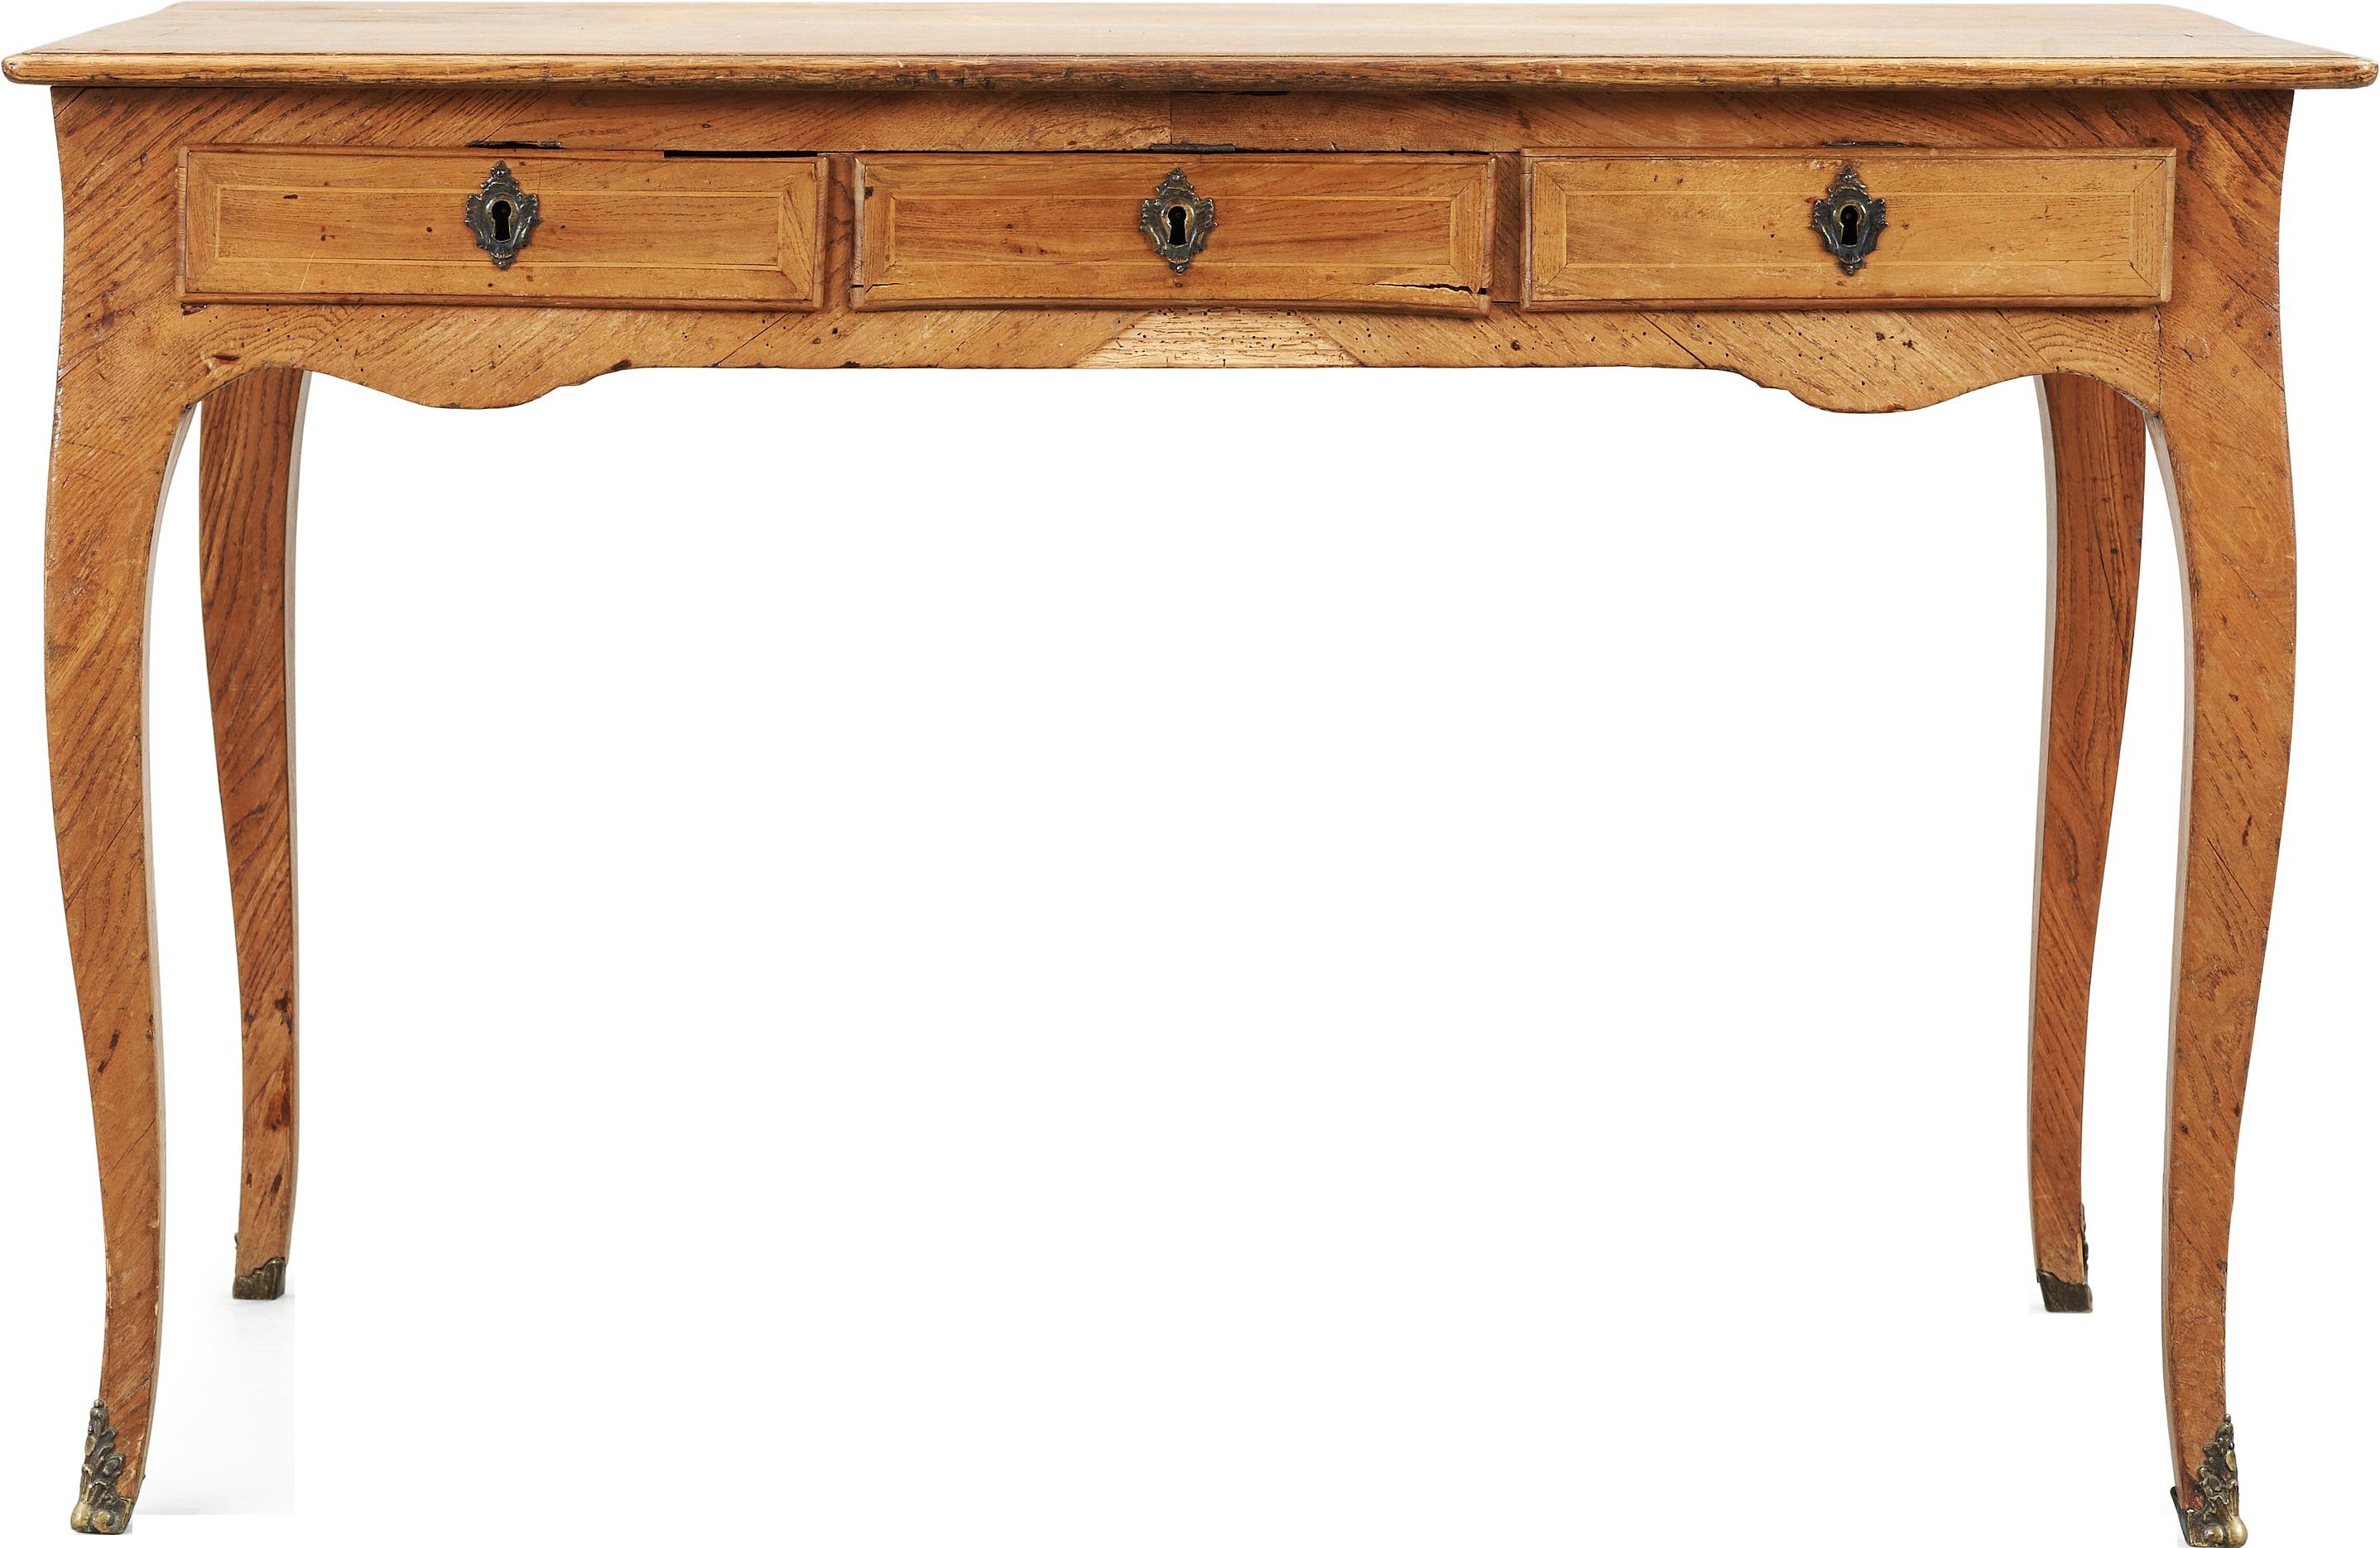 Table png image free. Desk clipart desk drawer